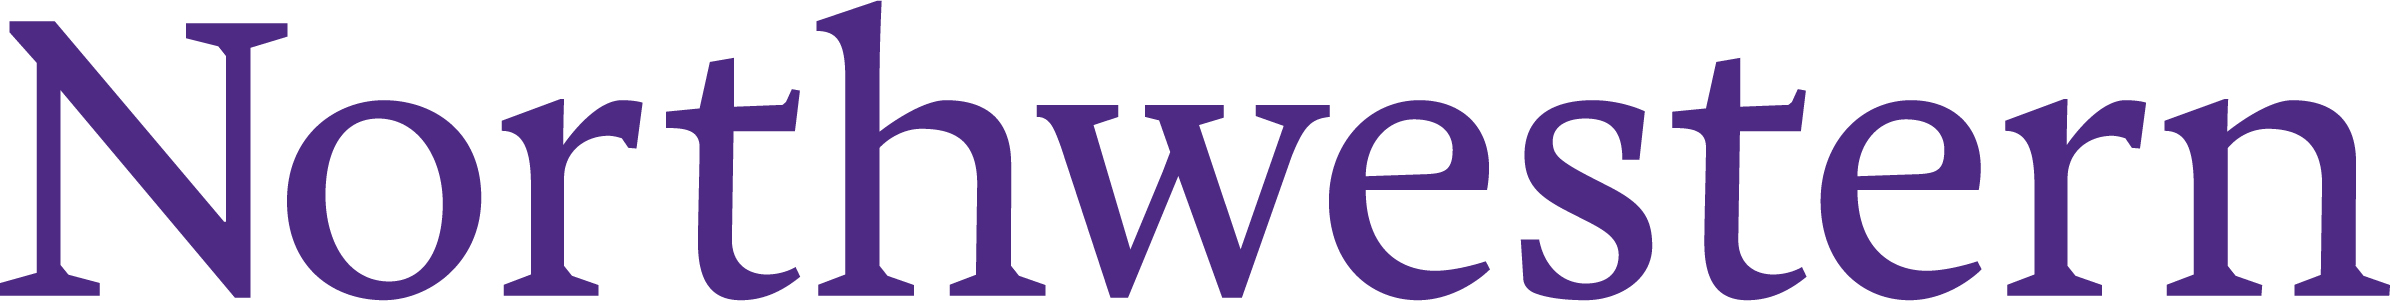 Northwestern_purple_RGB.jpg